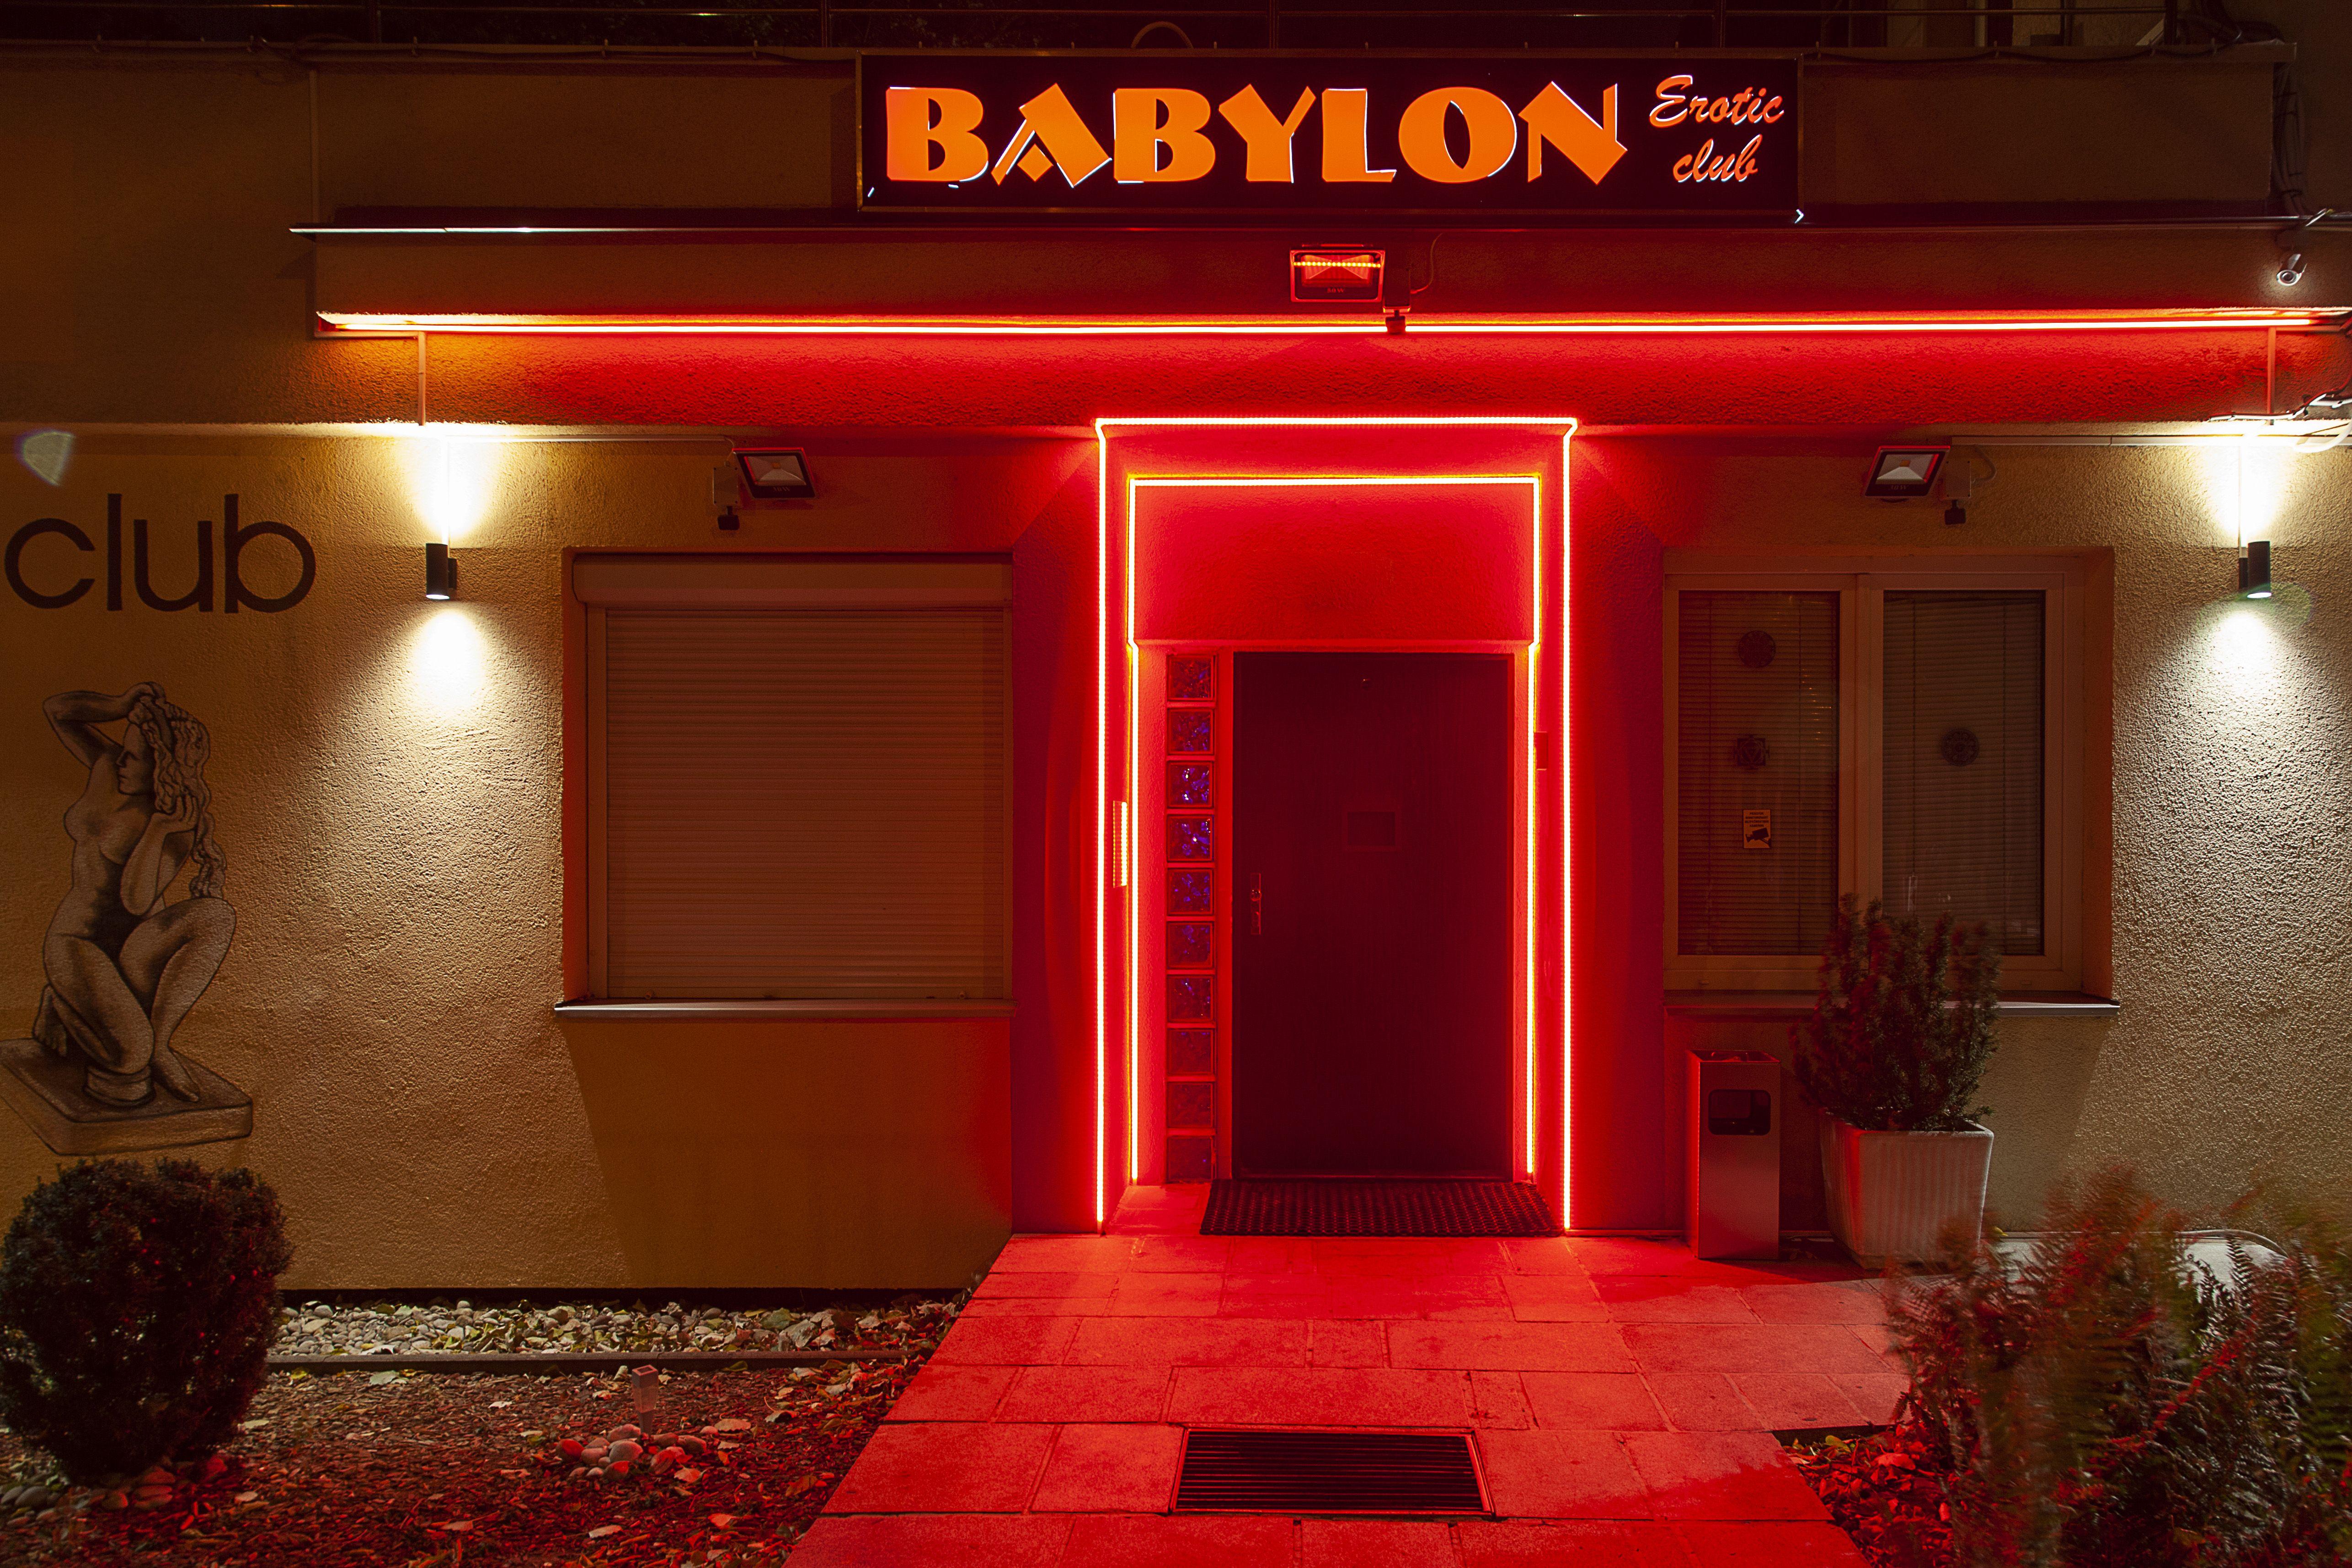 Babylon Night Club Babylon Night Club Starohajska 3 Bratislava Entry Entry Signs Babylon Night Club